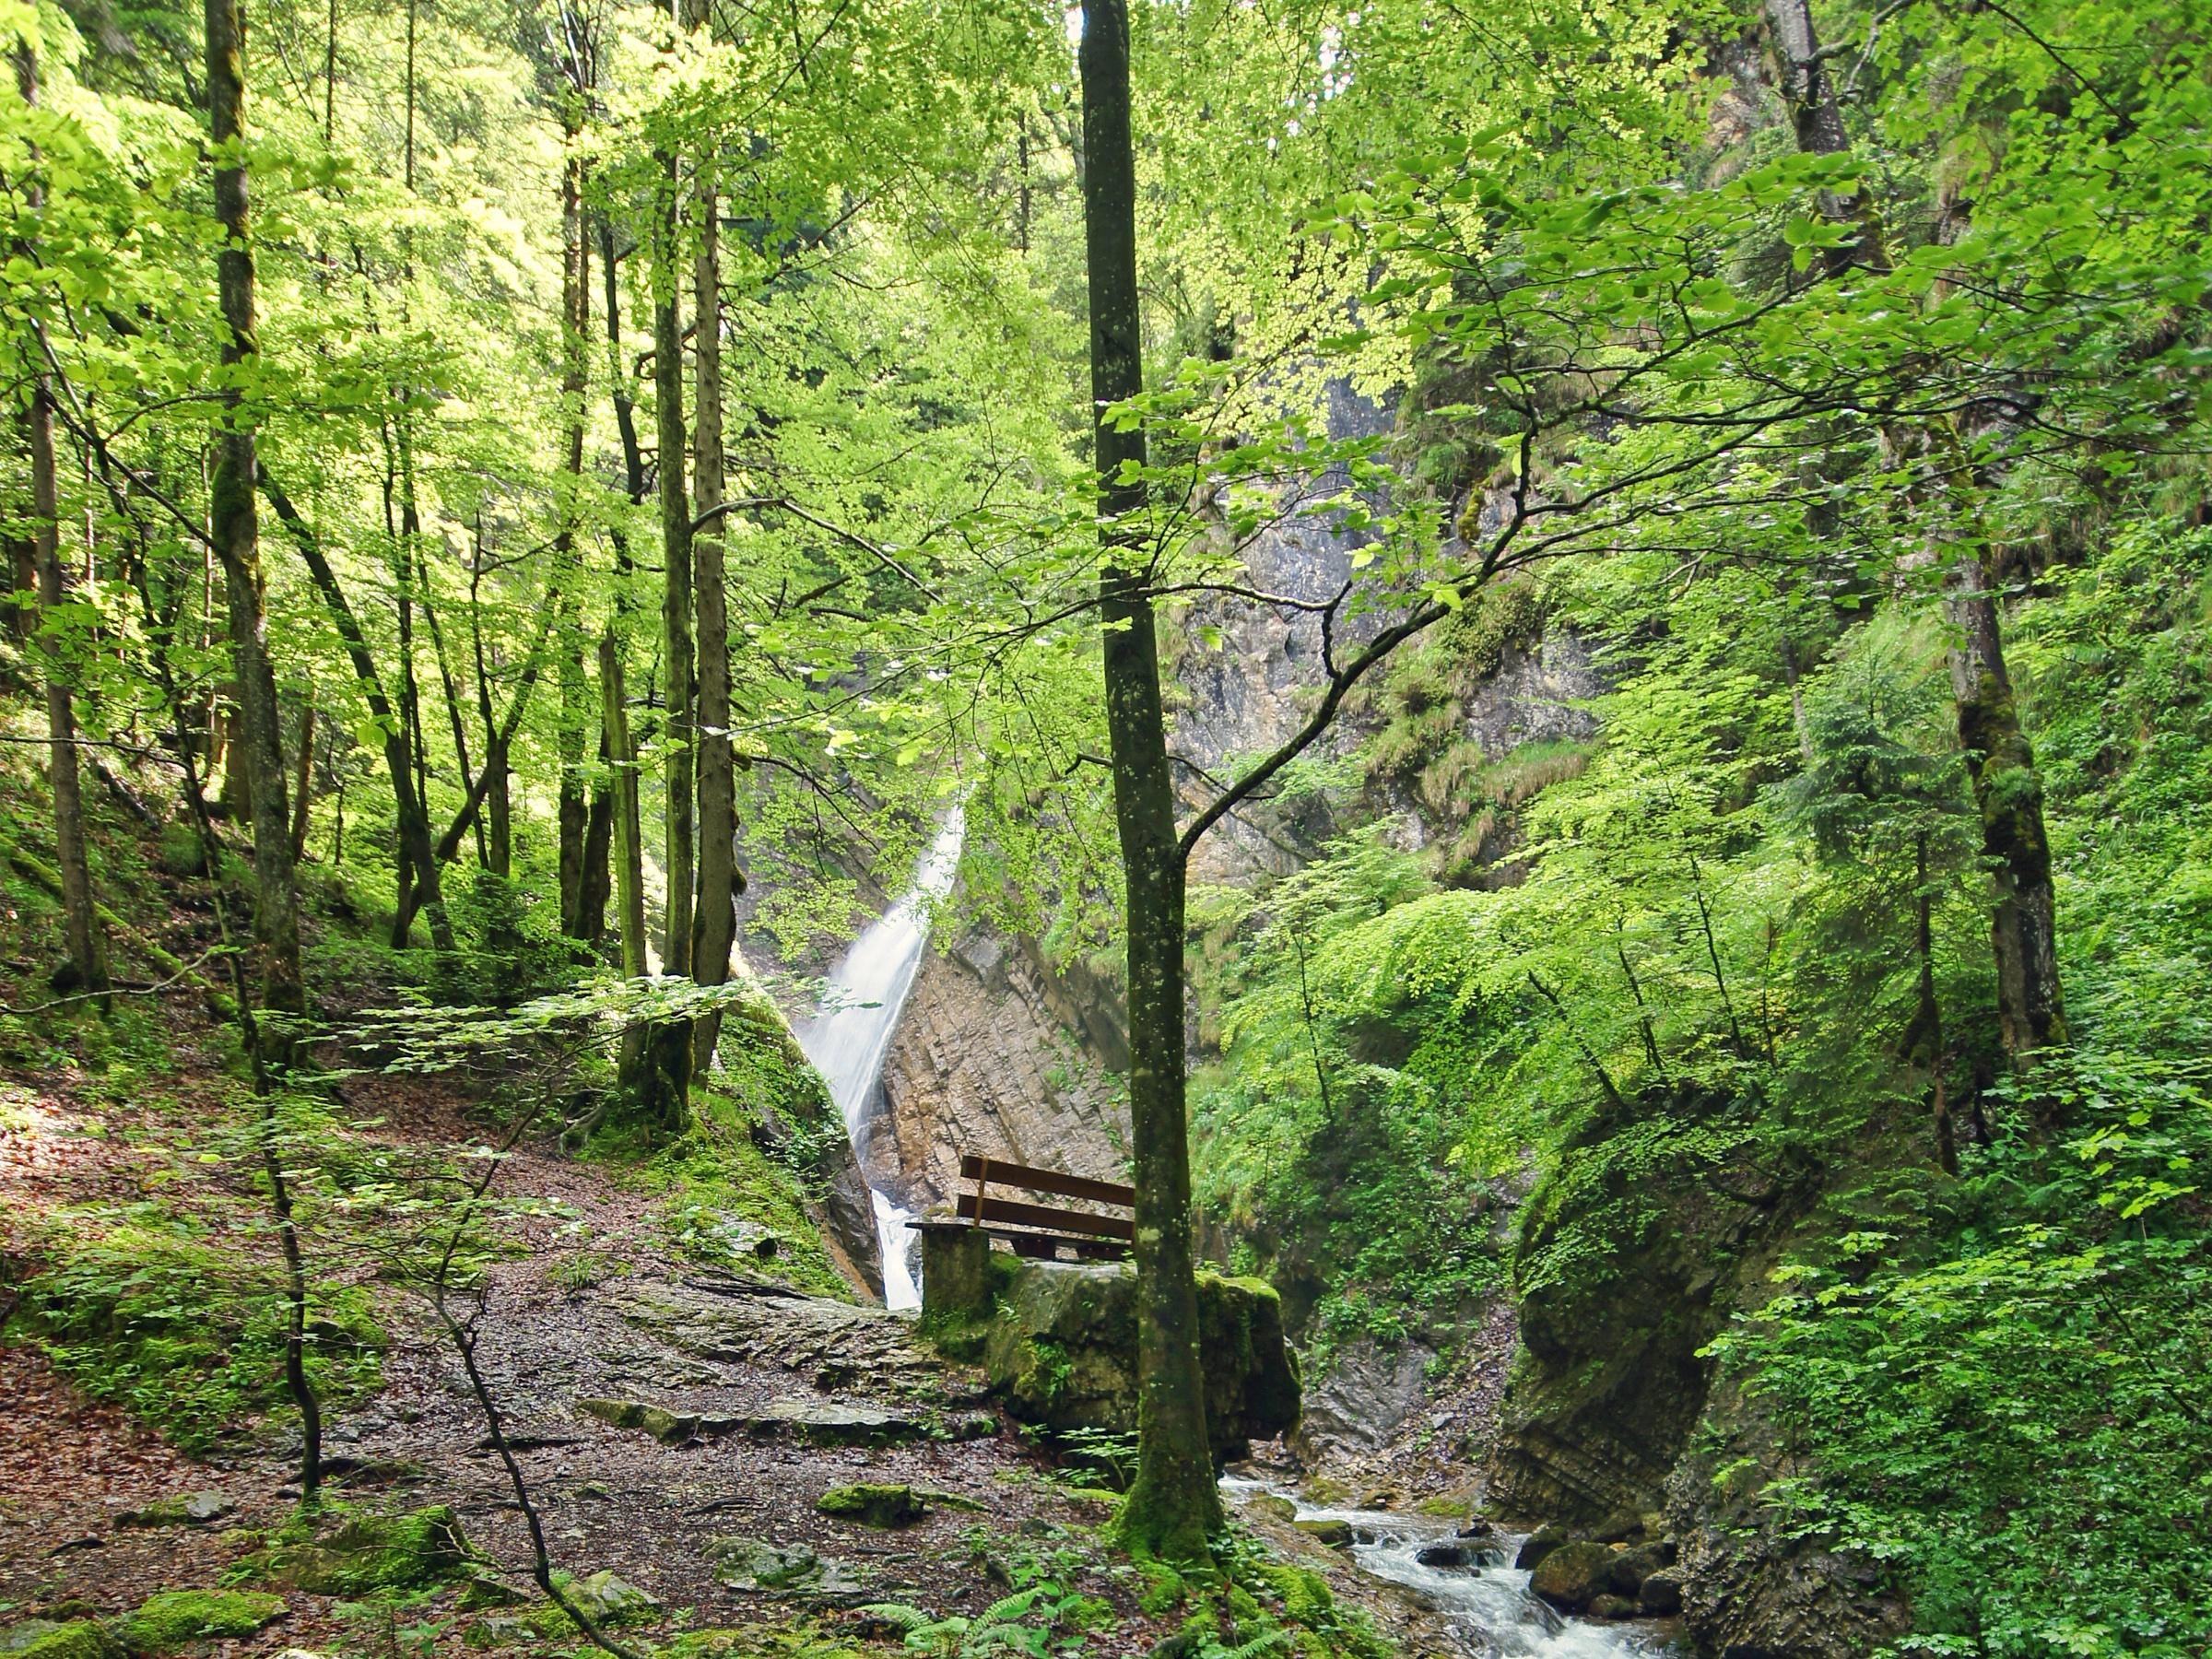 Wasserfall in Berg